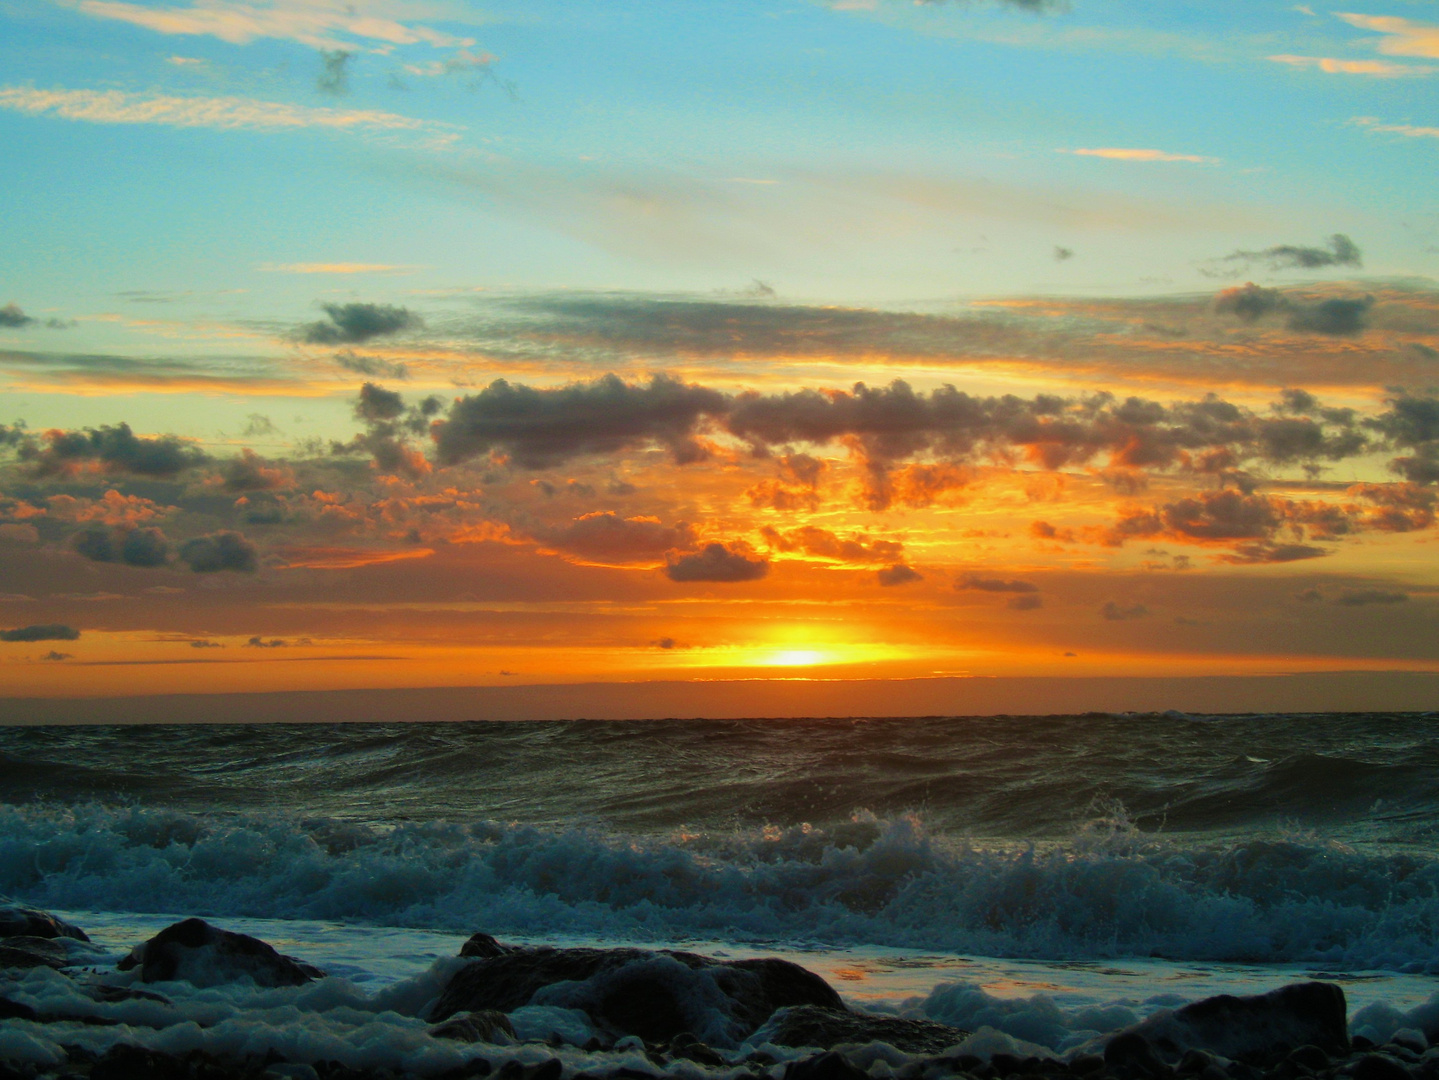 Sonnenuntergang im Winter 2015 auf Fehmarn